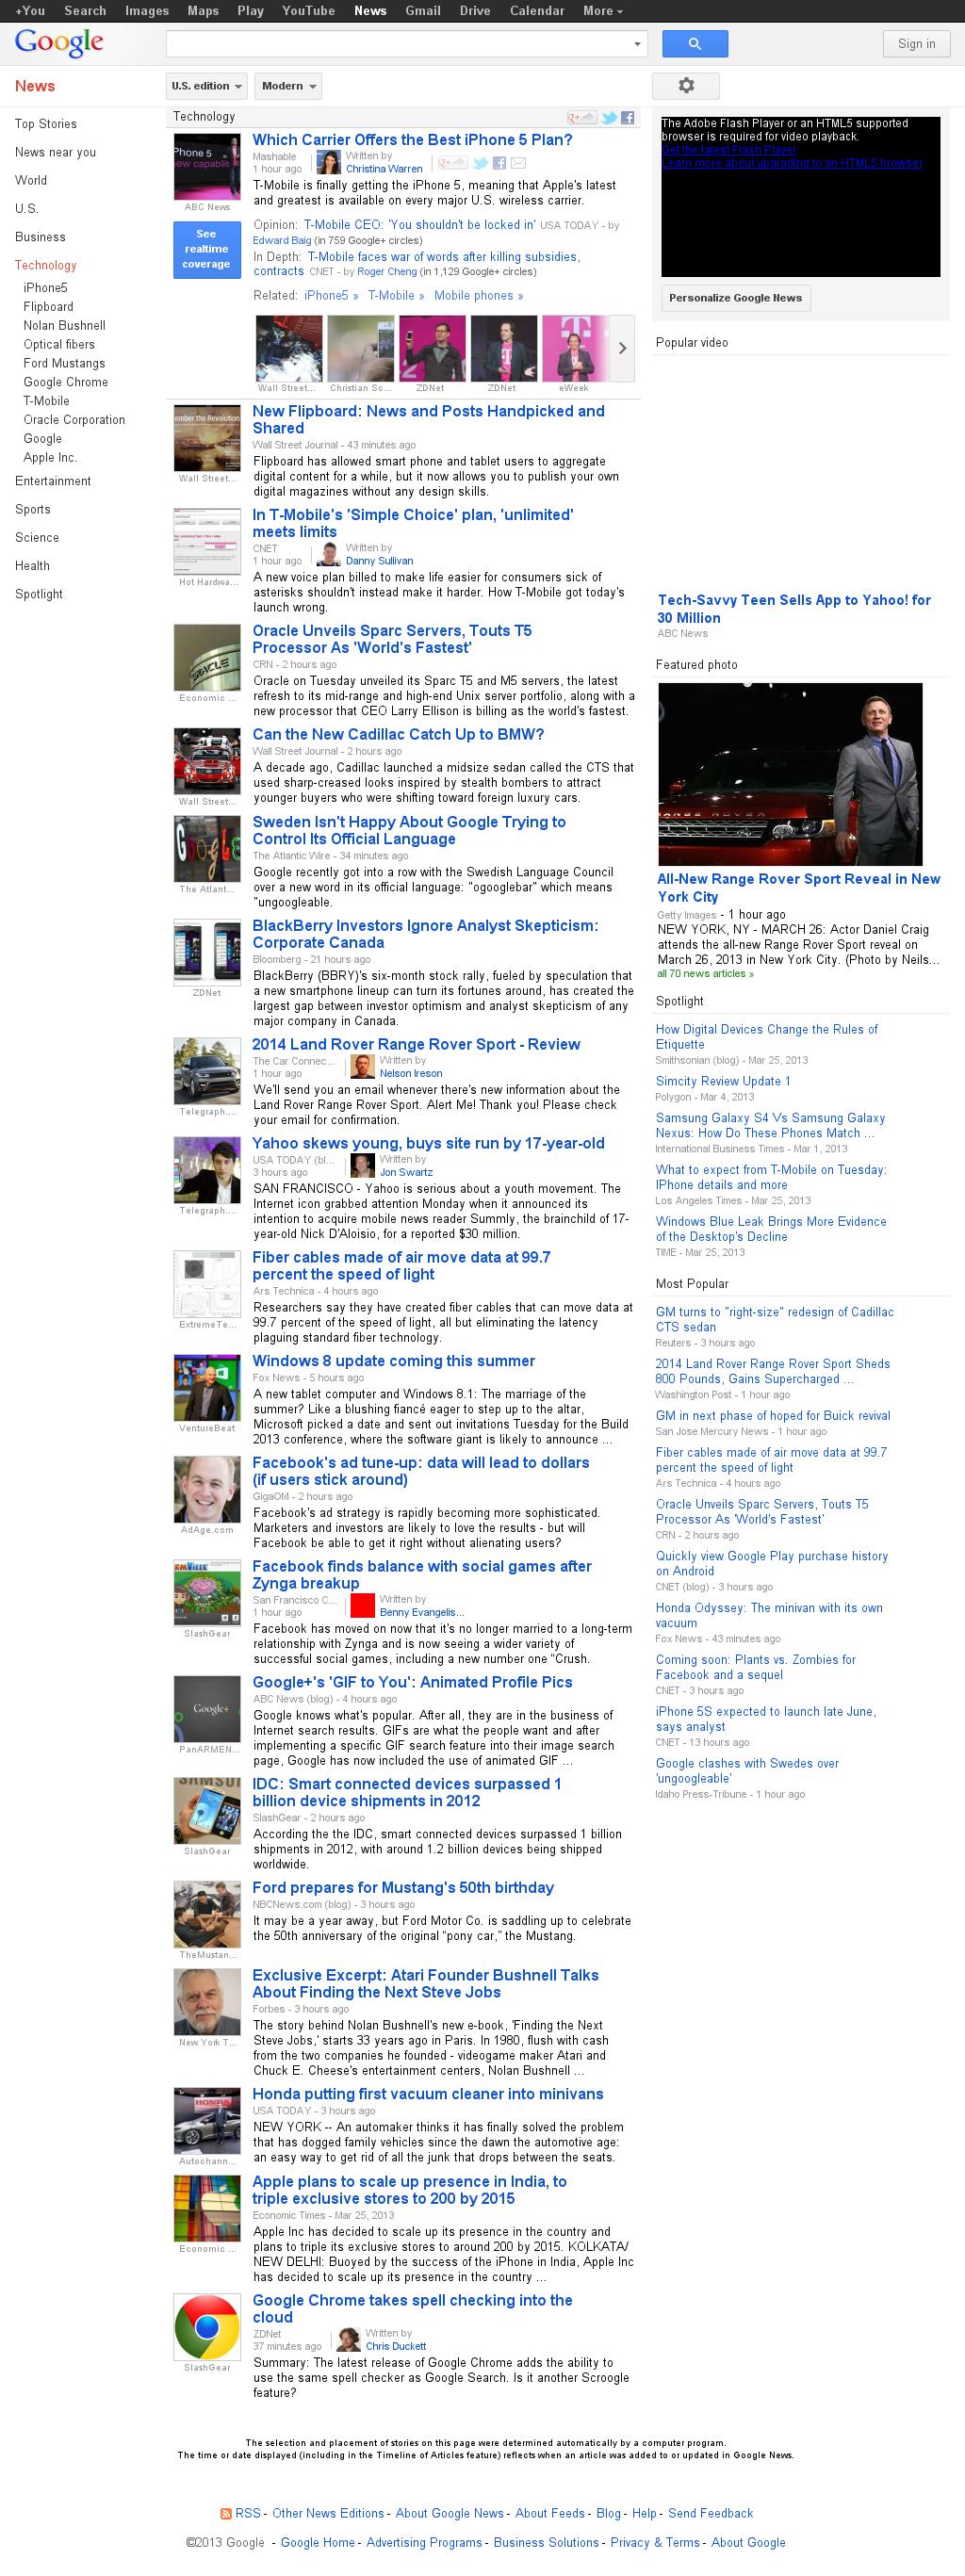 Google News: Technology at Wednesday March 27, 2013, 2:08 a.m. UTC